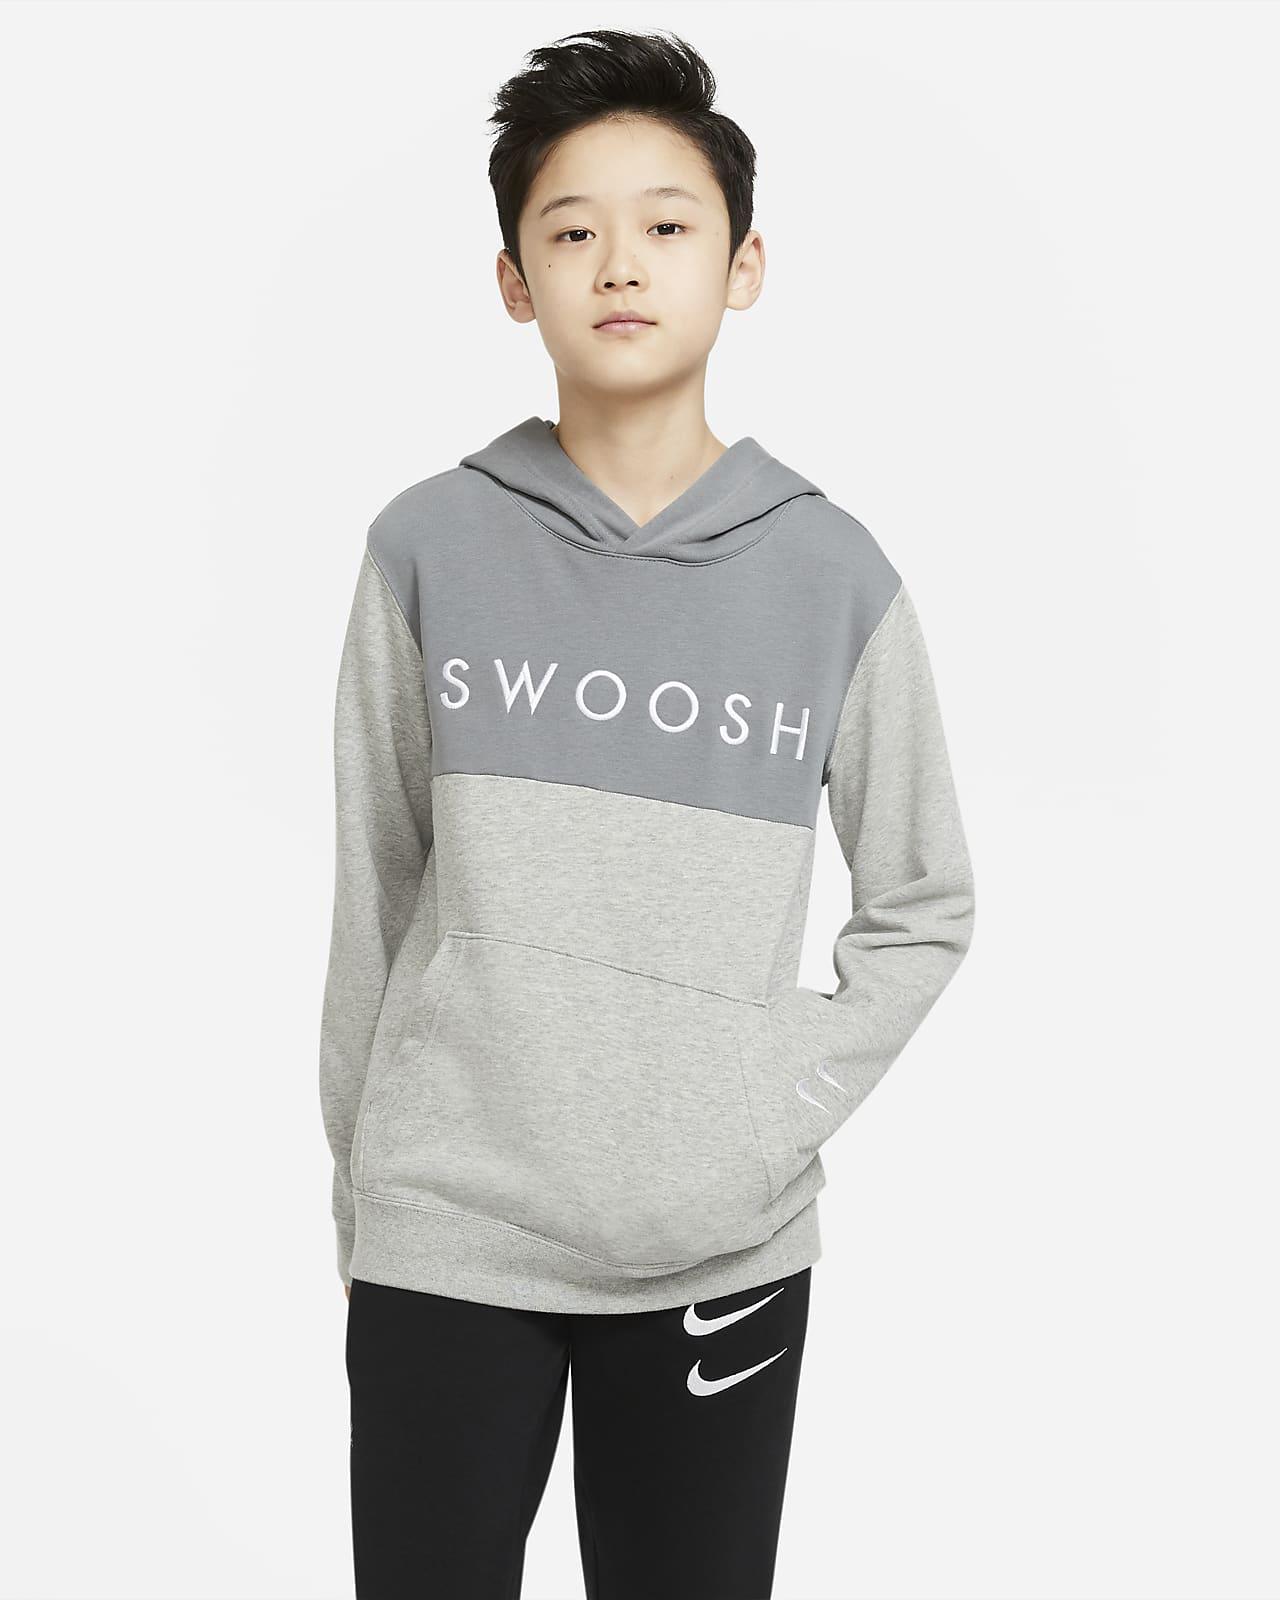 Sweat à capuche en molleton Nike Sportswear Swoosh pour Garçon plus âgé